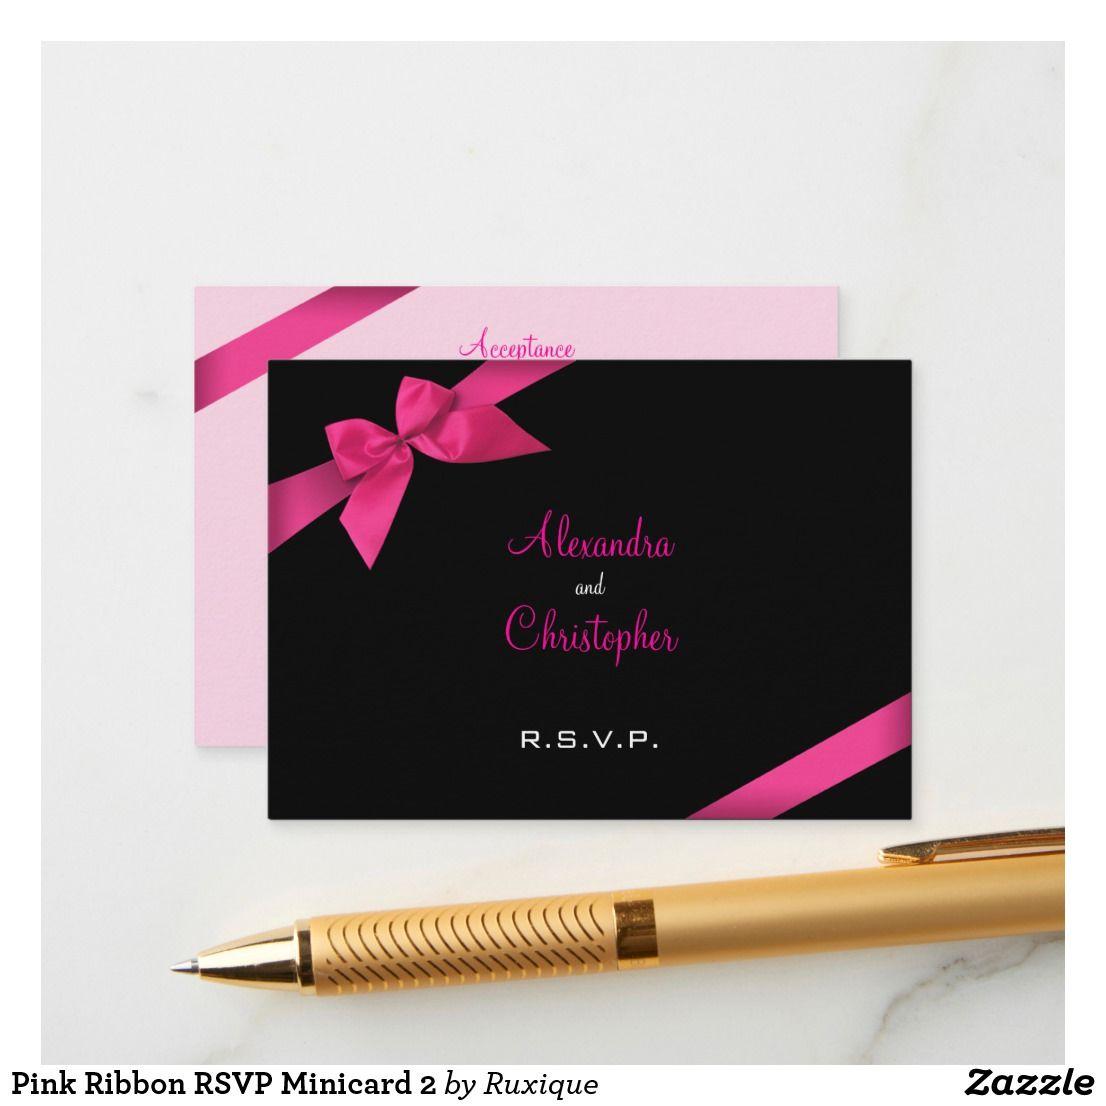 Pink Ribbon RSVP Minicard 2 Enclosure Card